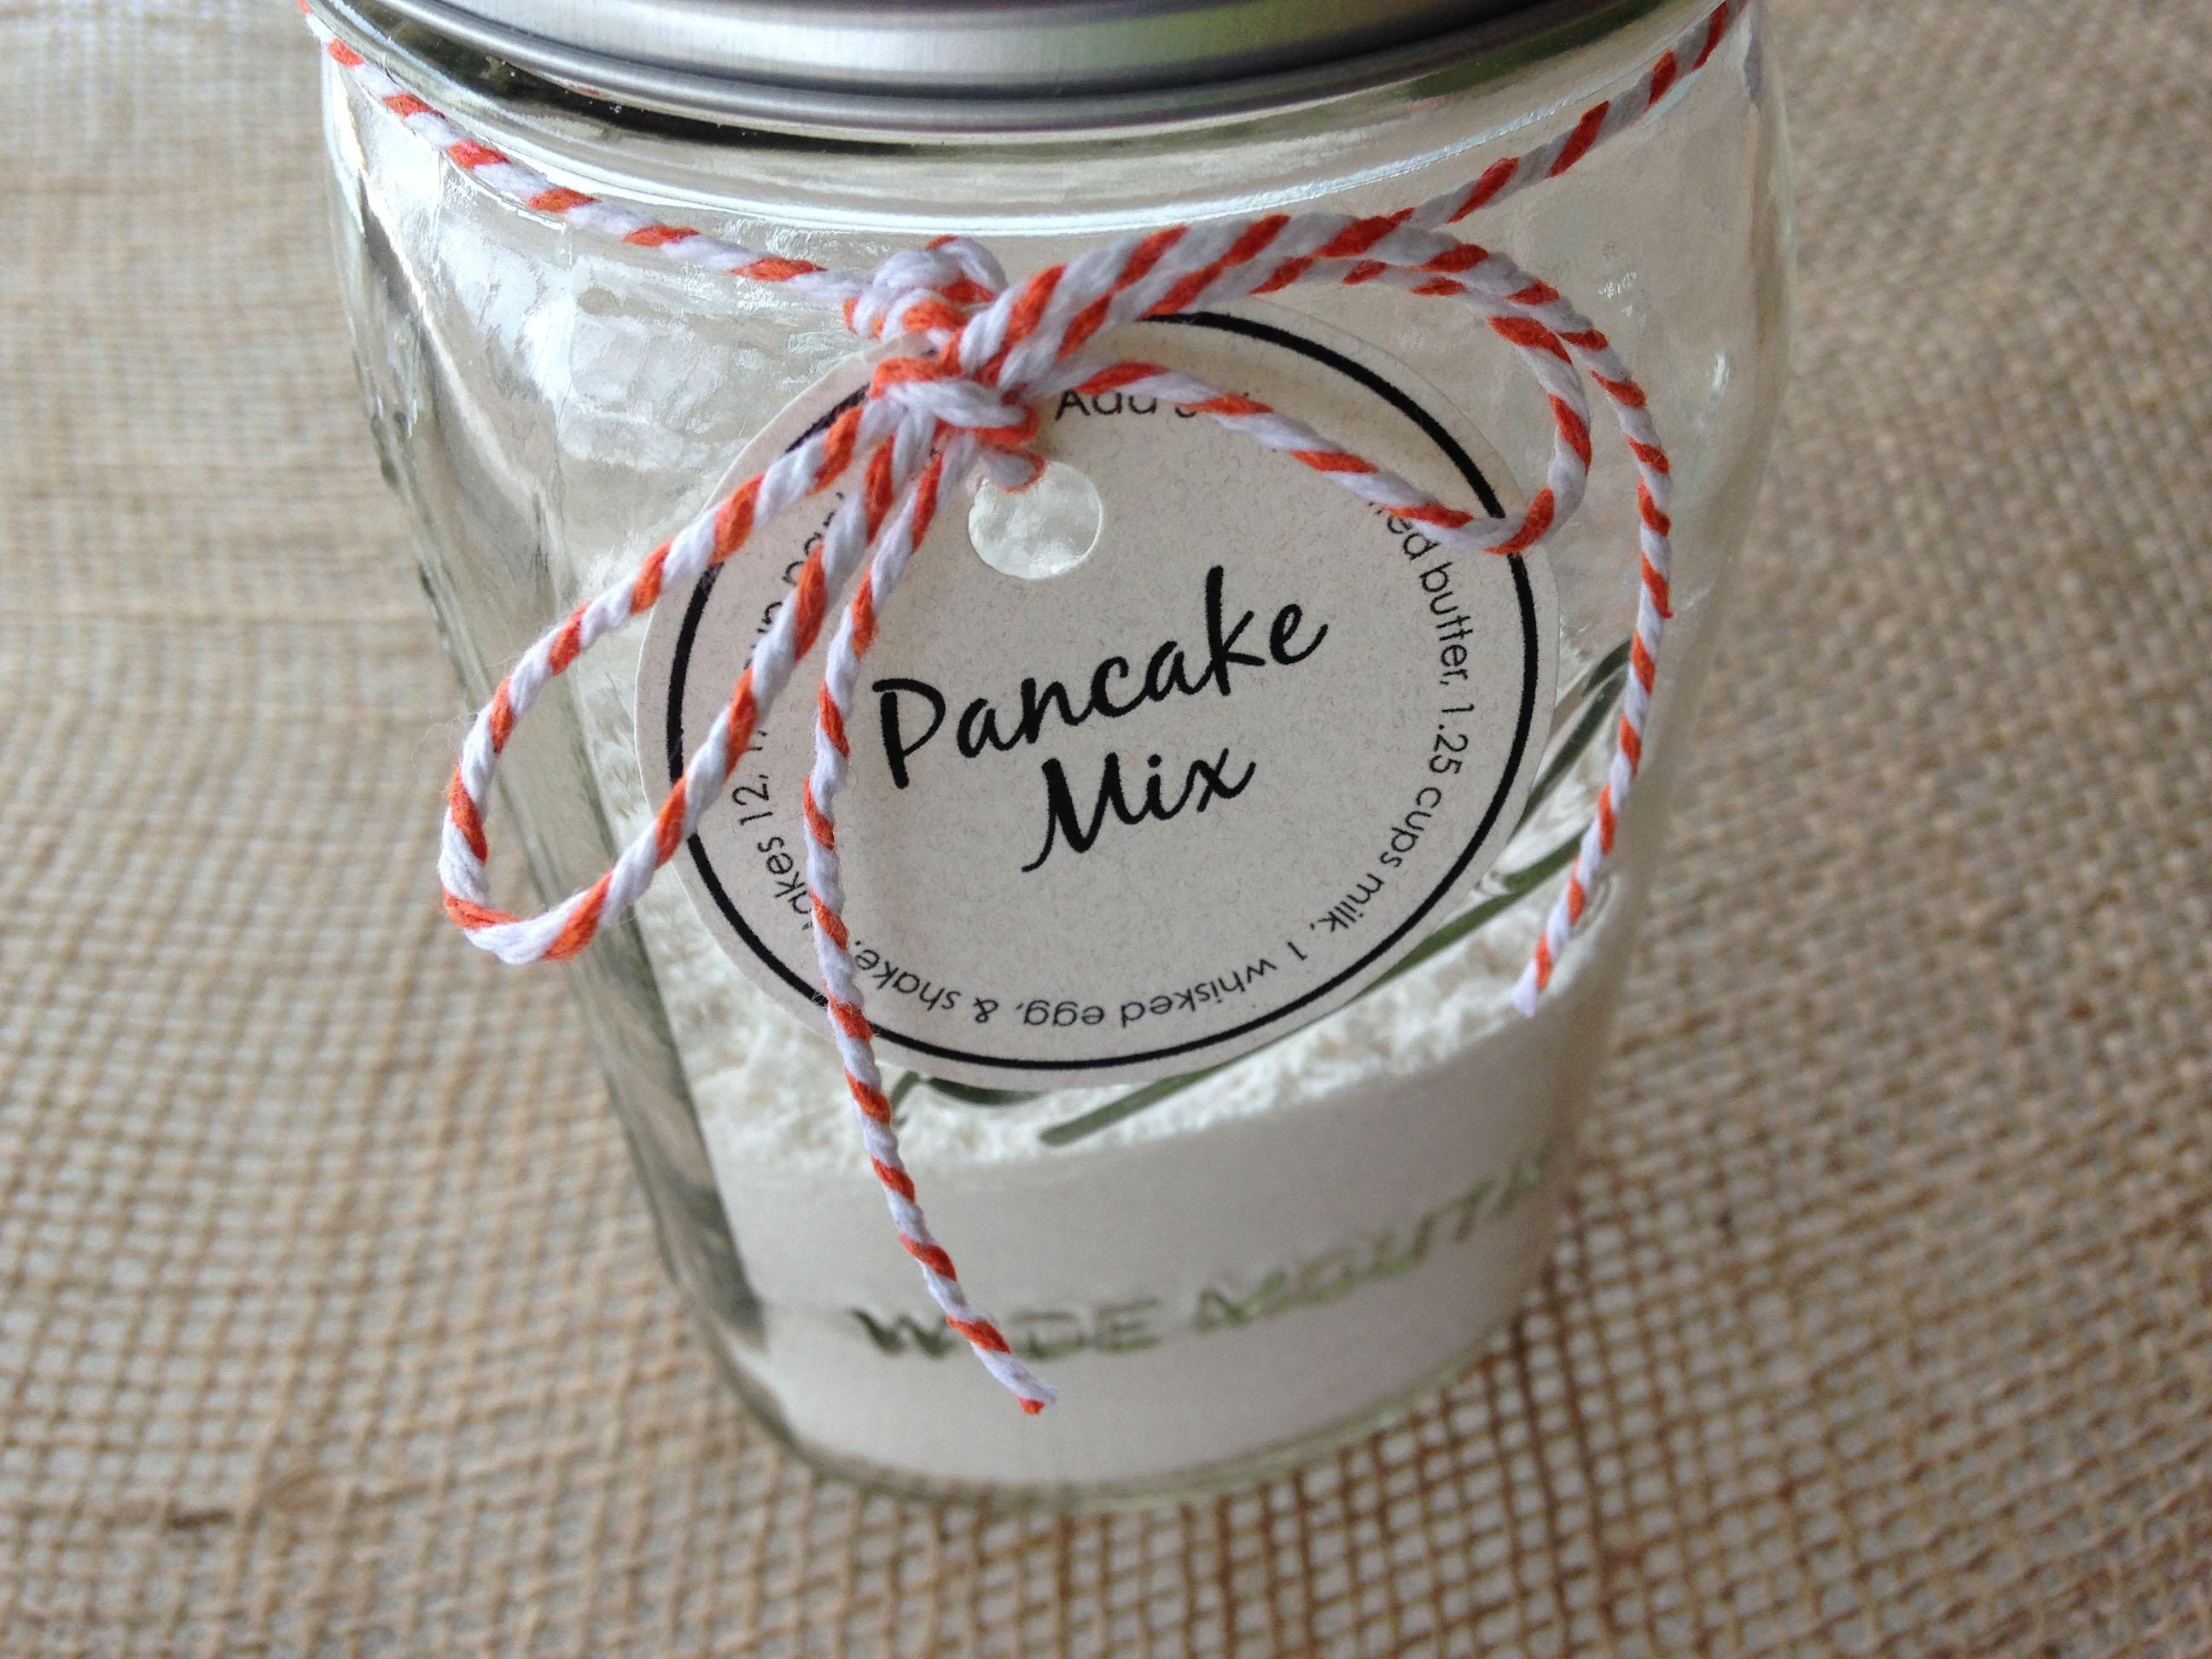 Recipe for Pancake Mix in a Jar